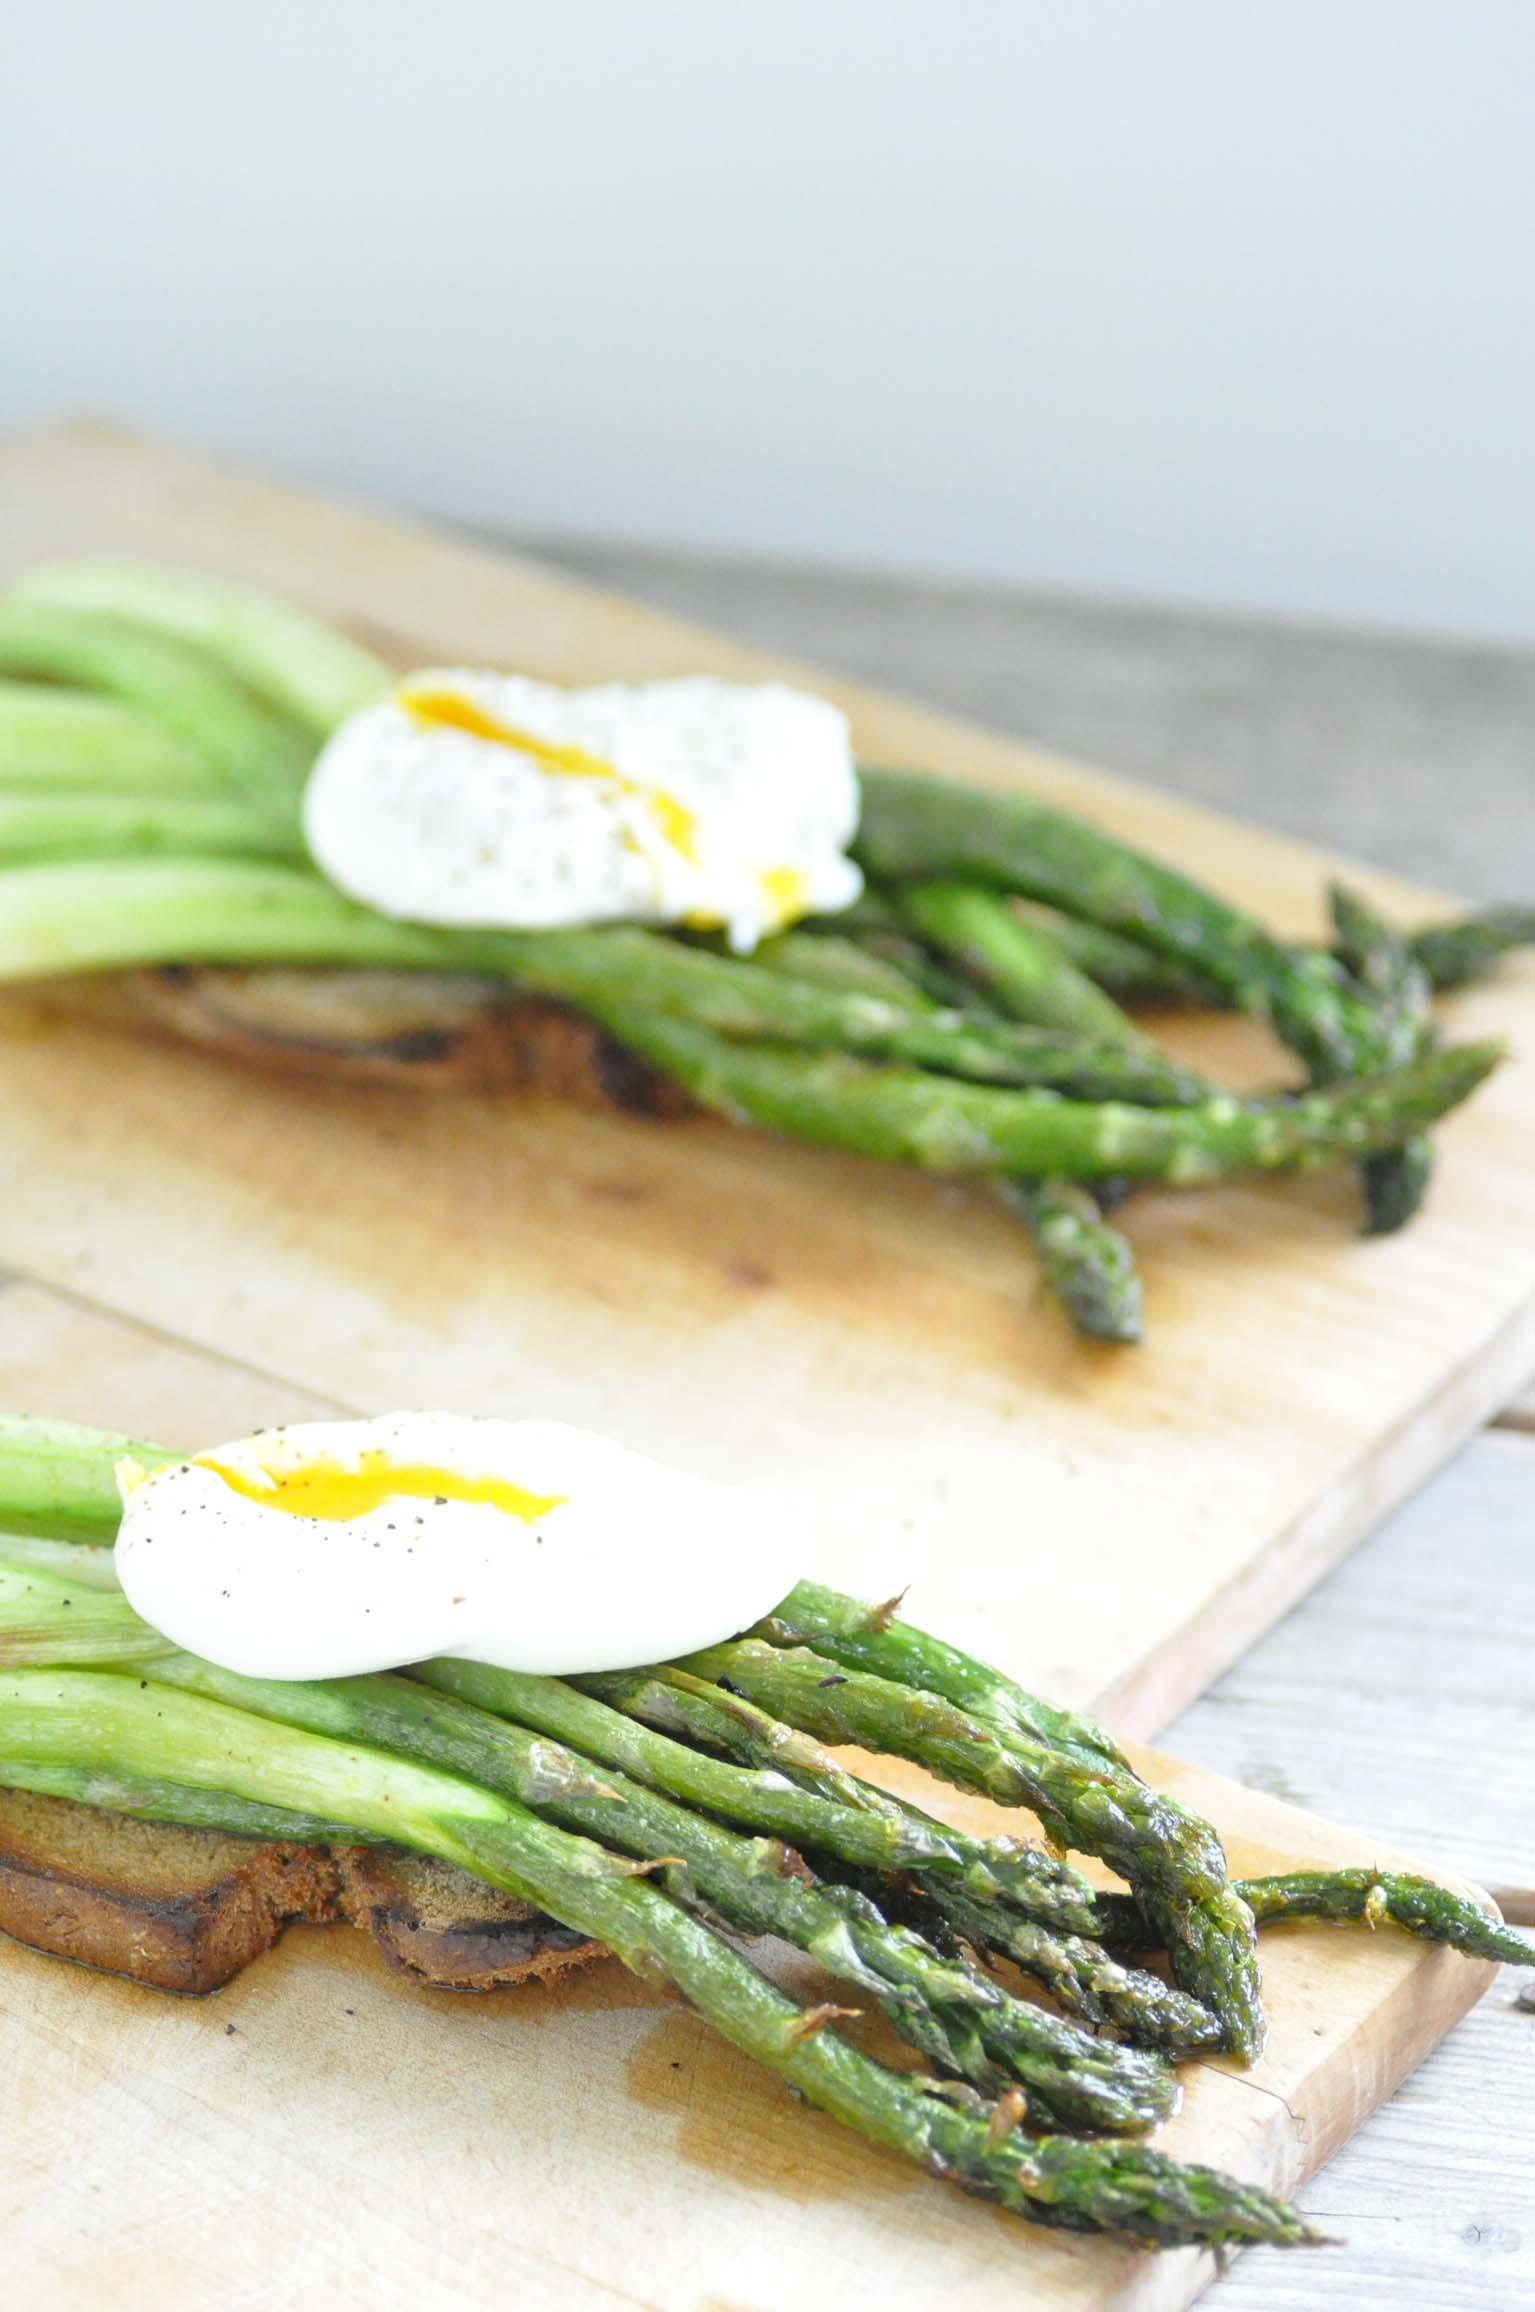 green asparagus with poaches egg_bearbeitet-1